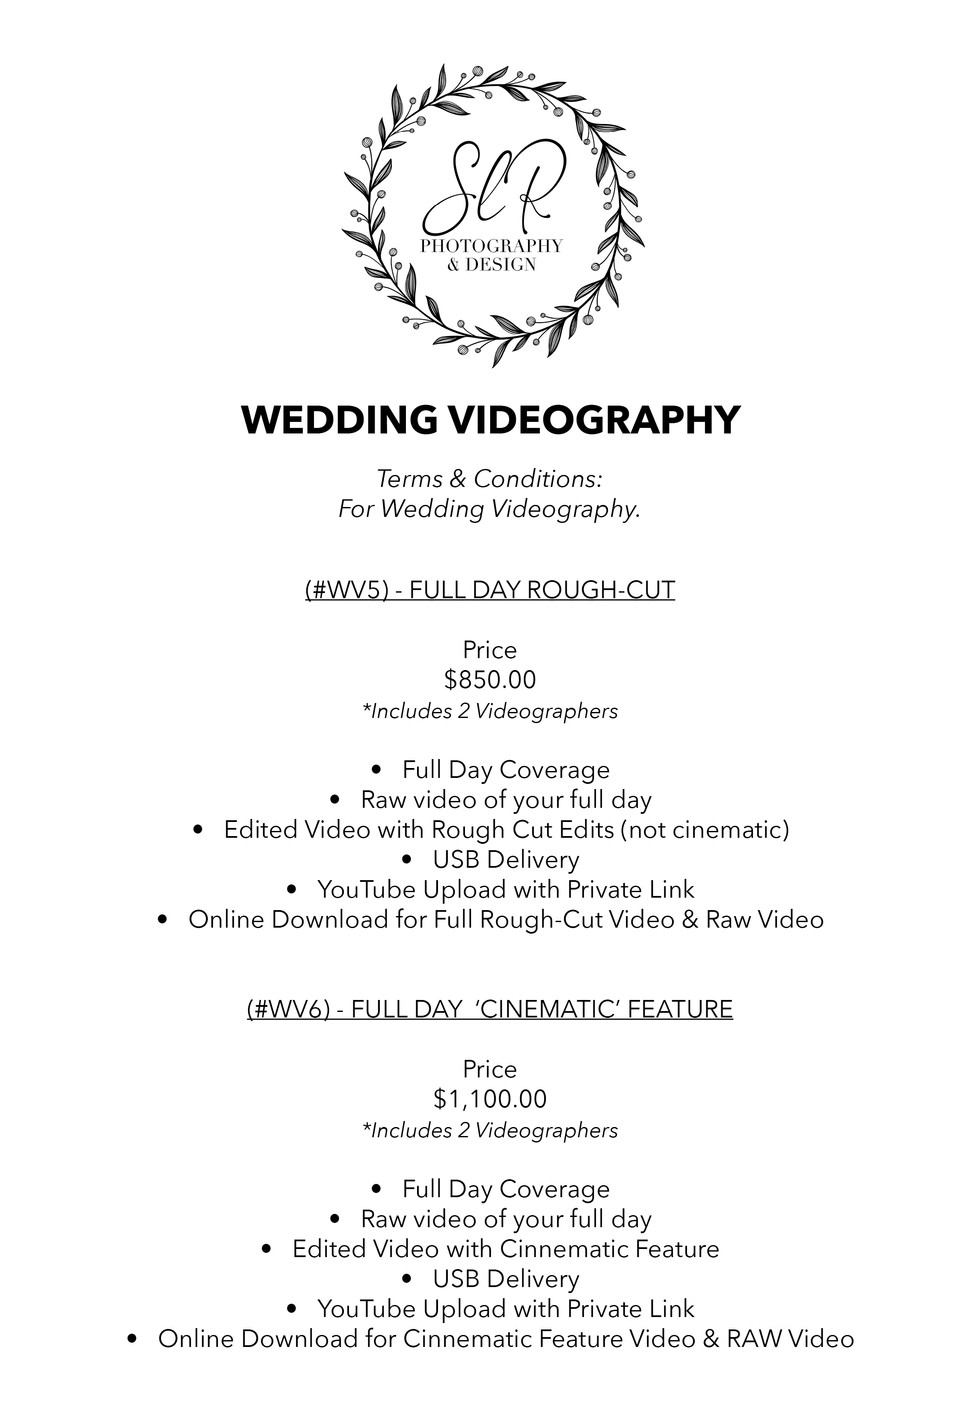 SLR Photography & Design price sheet -13